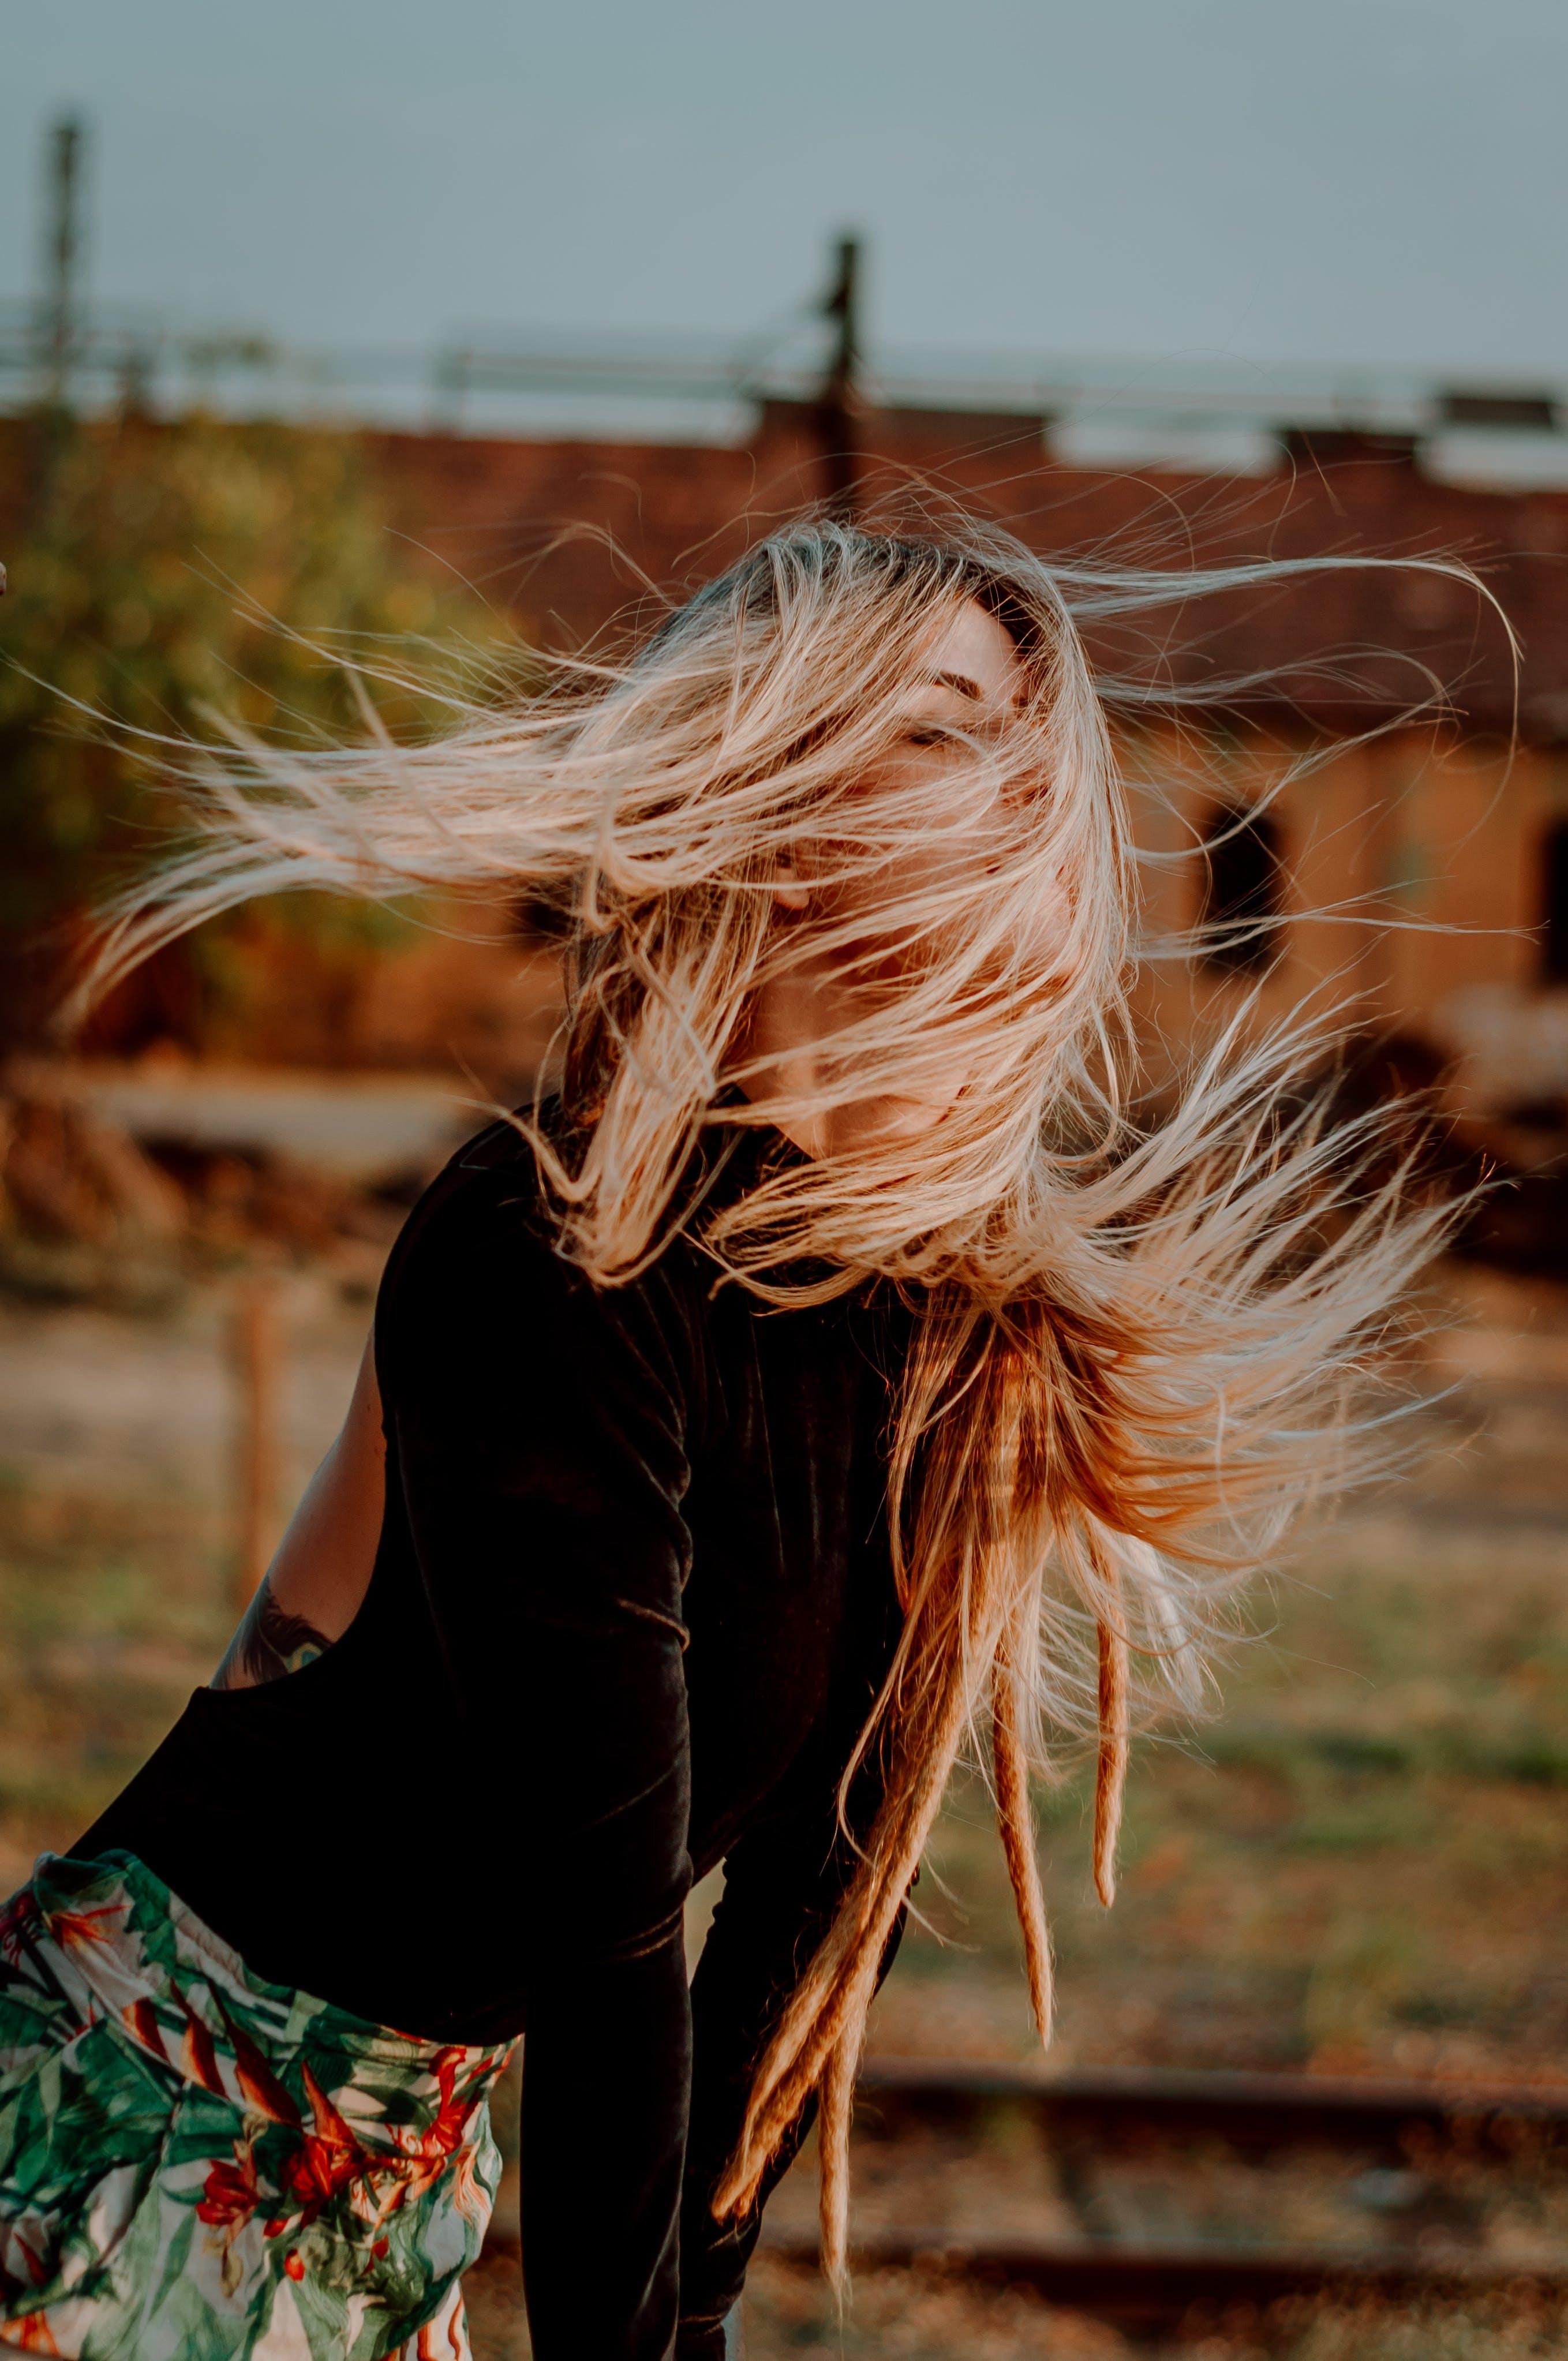 Fotos de stock gratuitas de actitud, cabello, cabello volando, desgaste